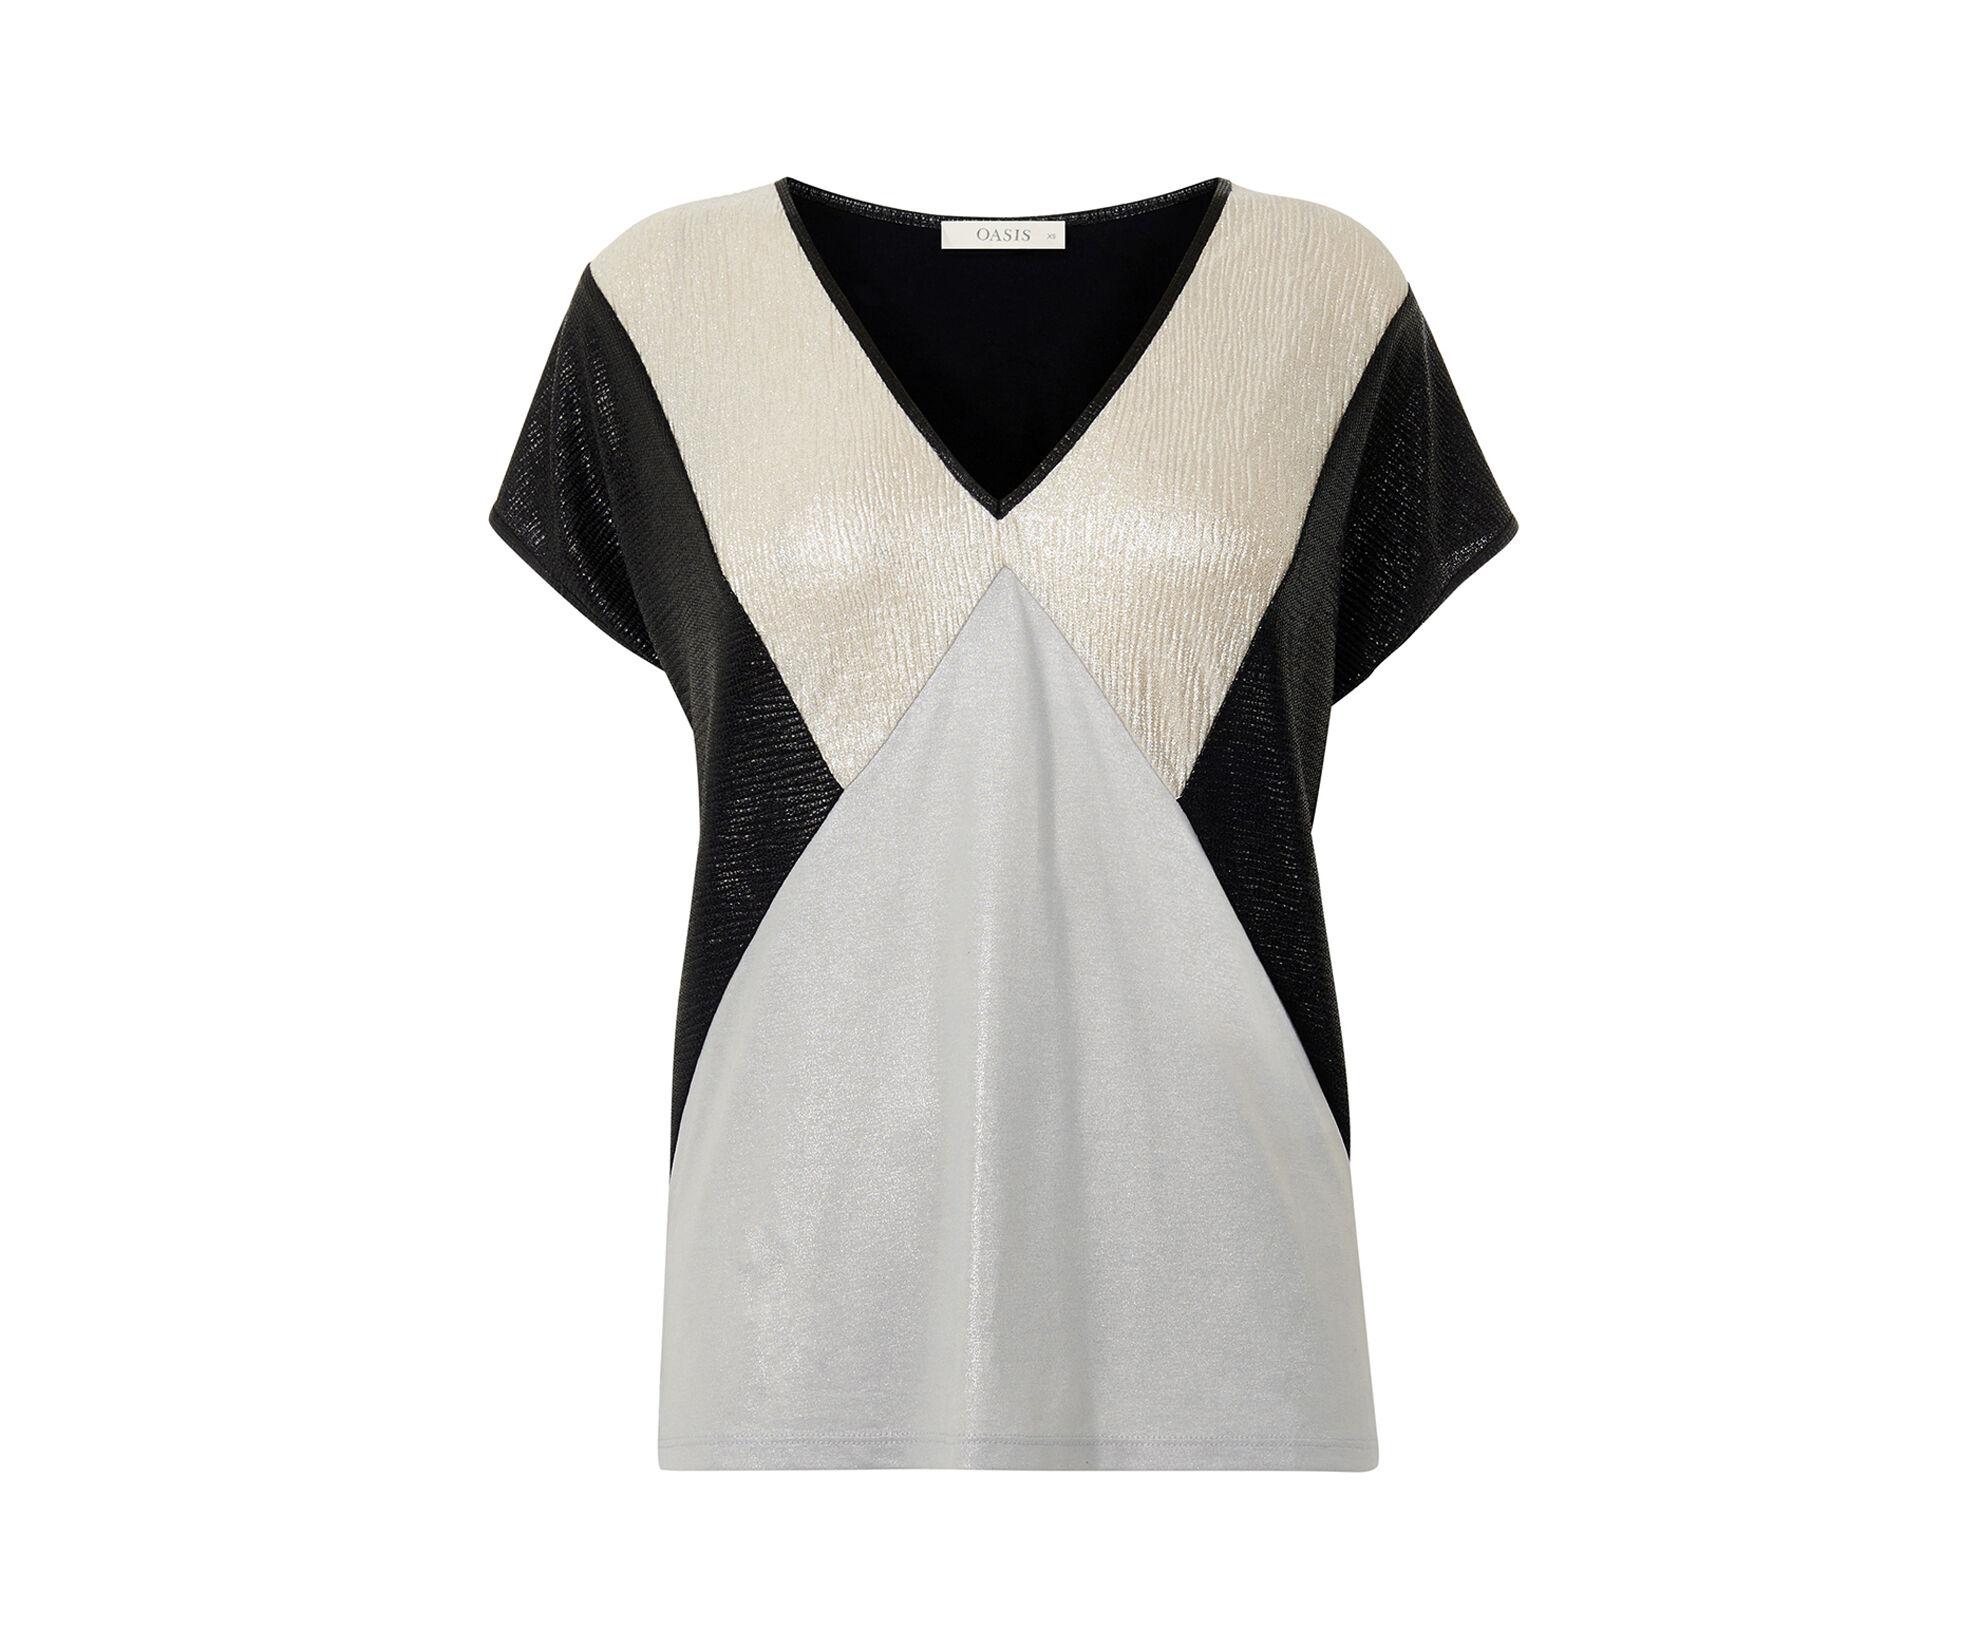 Shimmer clothing store carlsbad